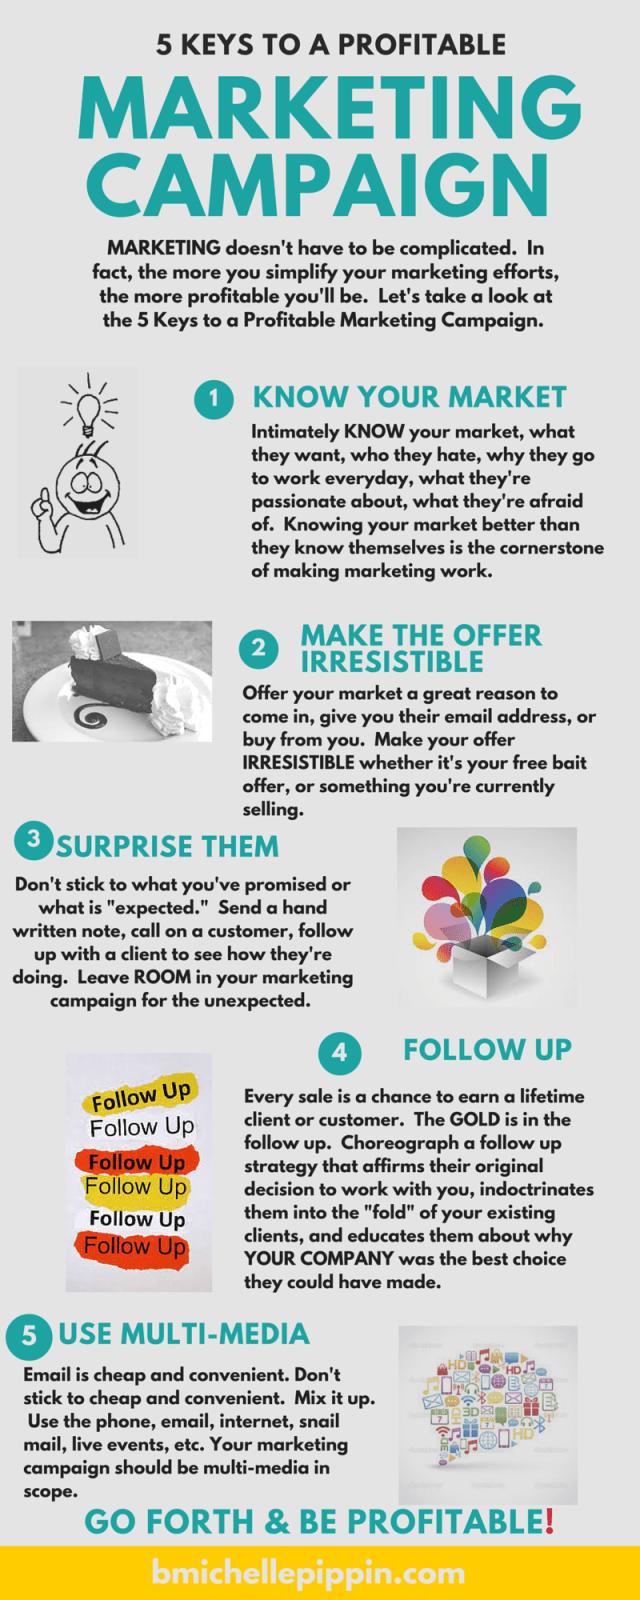 5 Keys to a Profitable Marketing Campaign